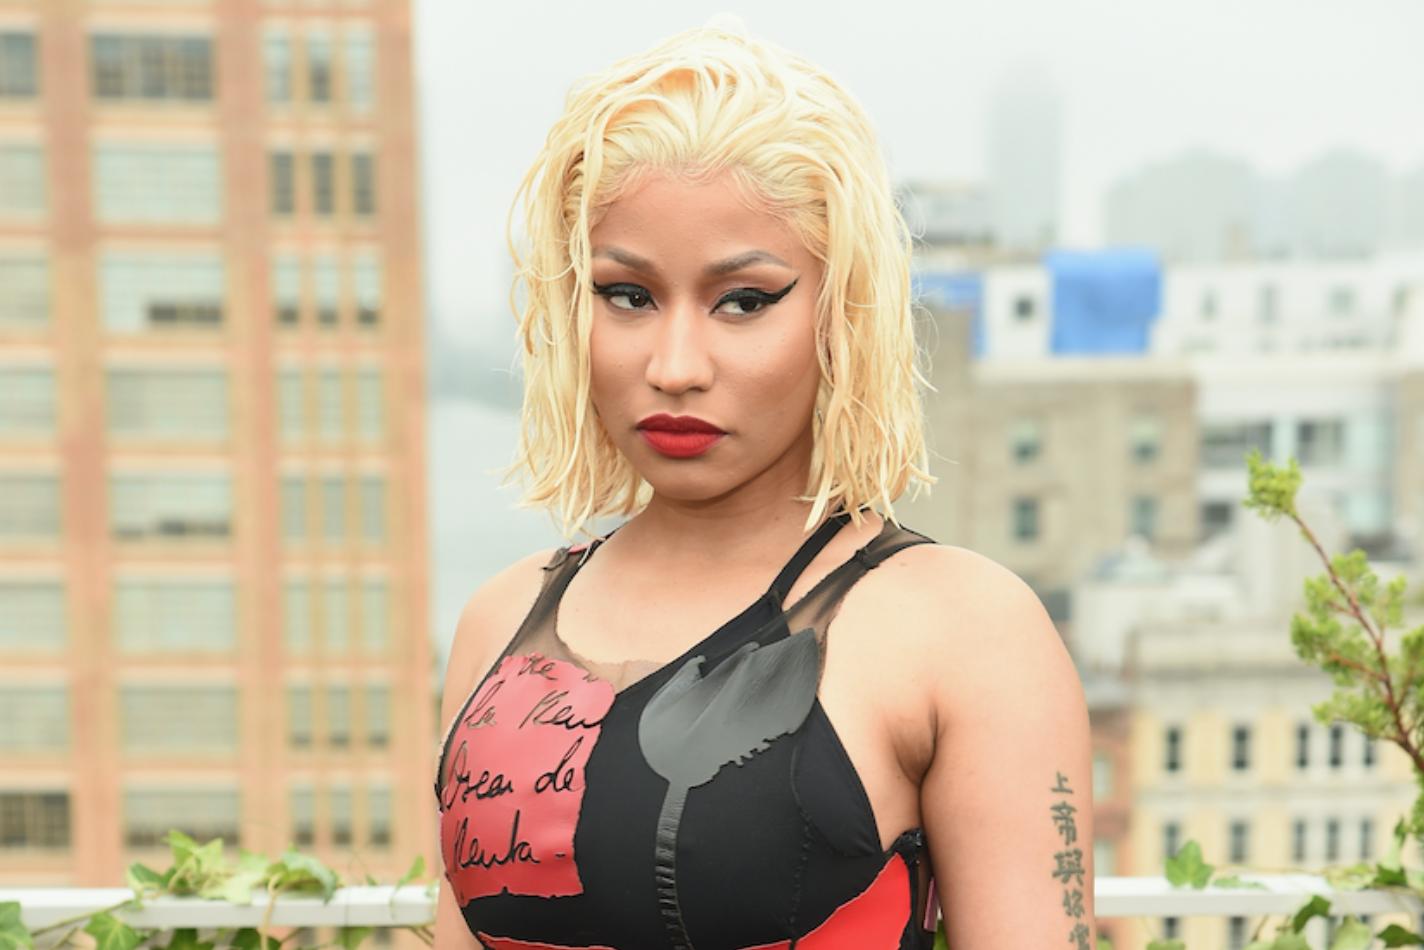 Nicki Minaj Seemingly Shades Cardi B for Using Ghostwriter